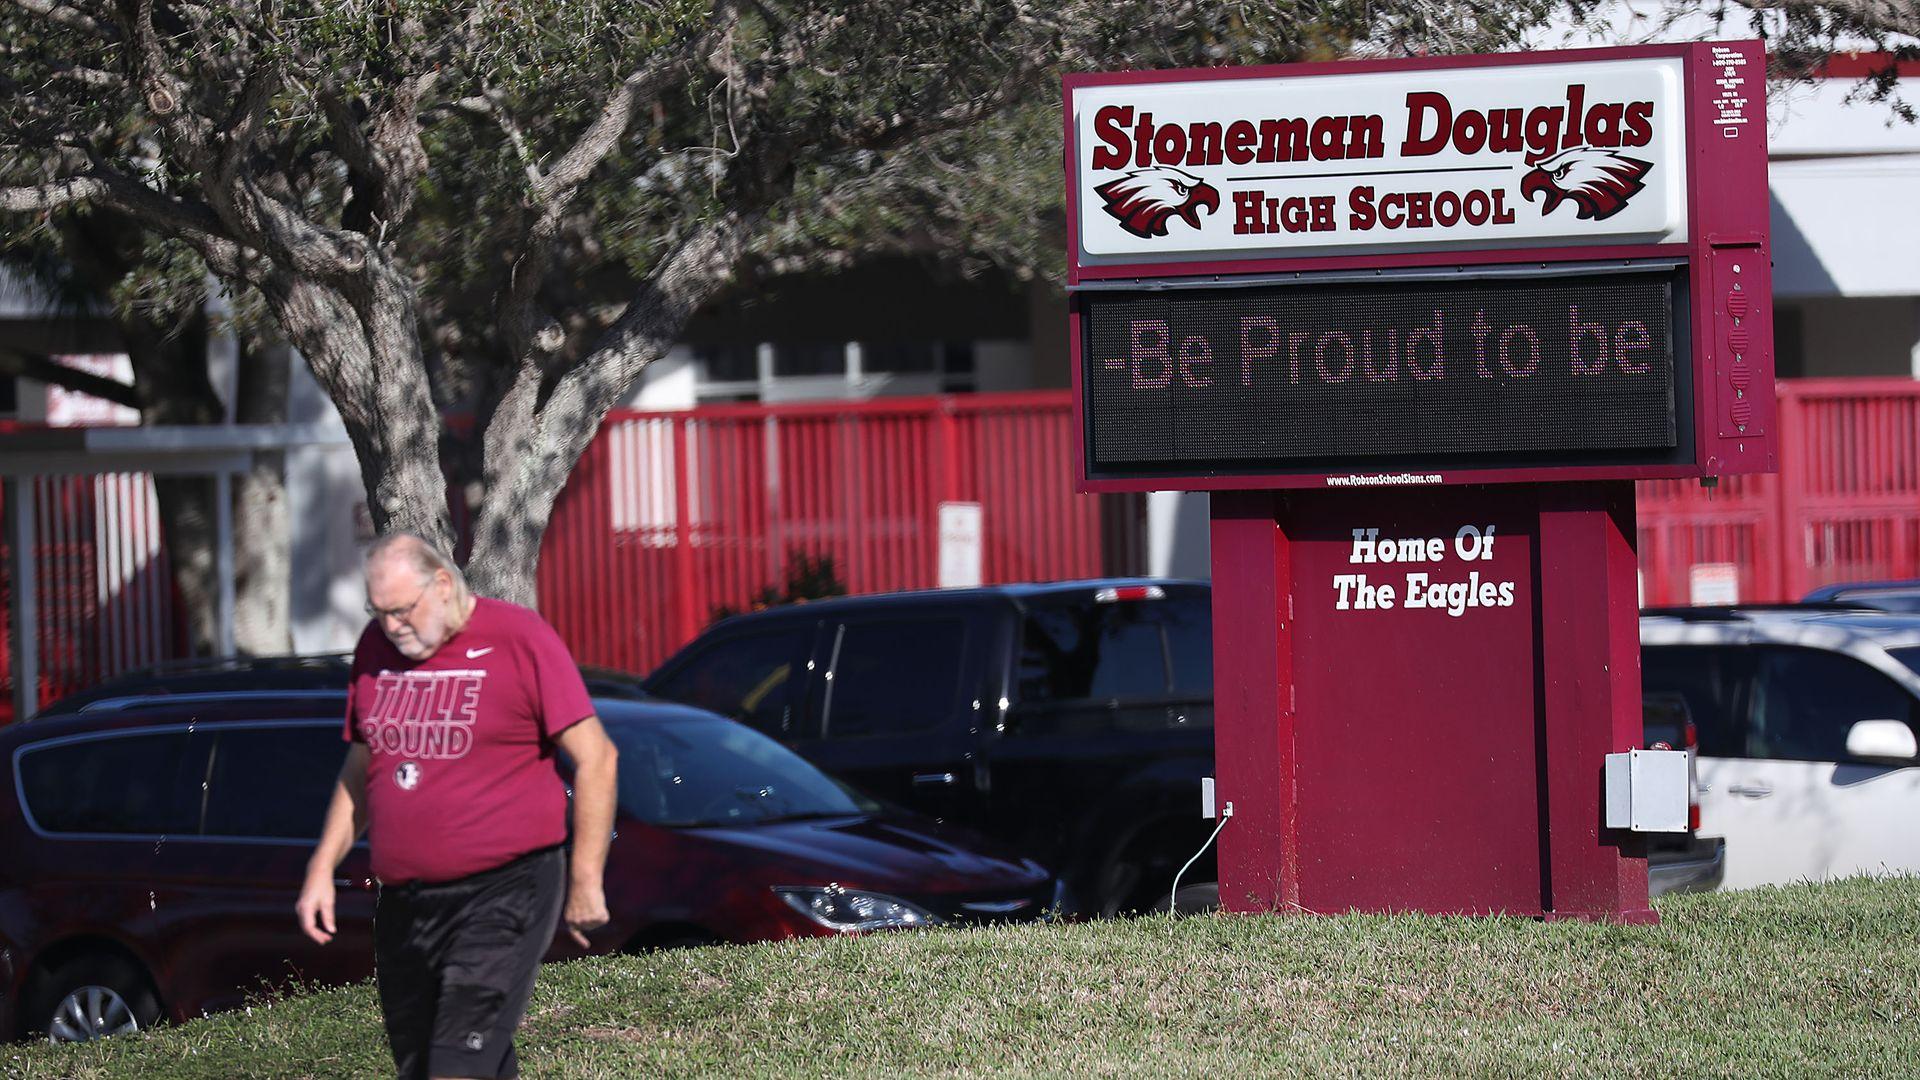 Marjory Douglas Stoneman High School in Parkland, Florida.